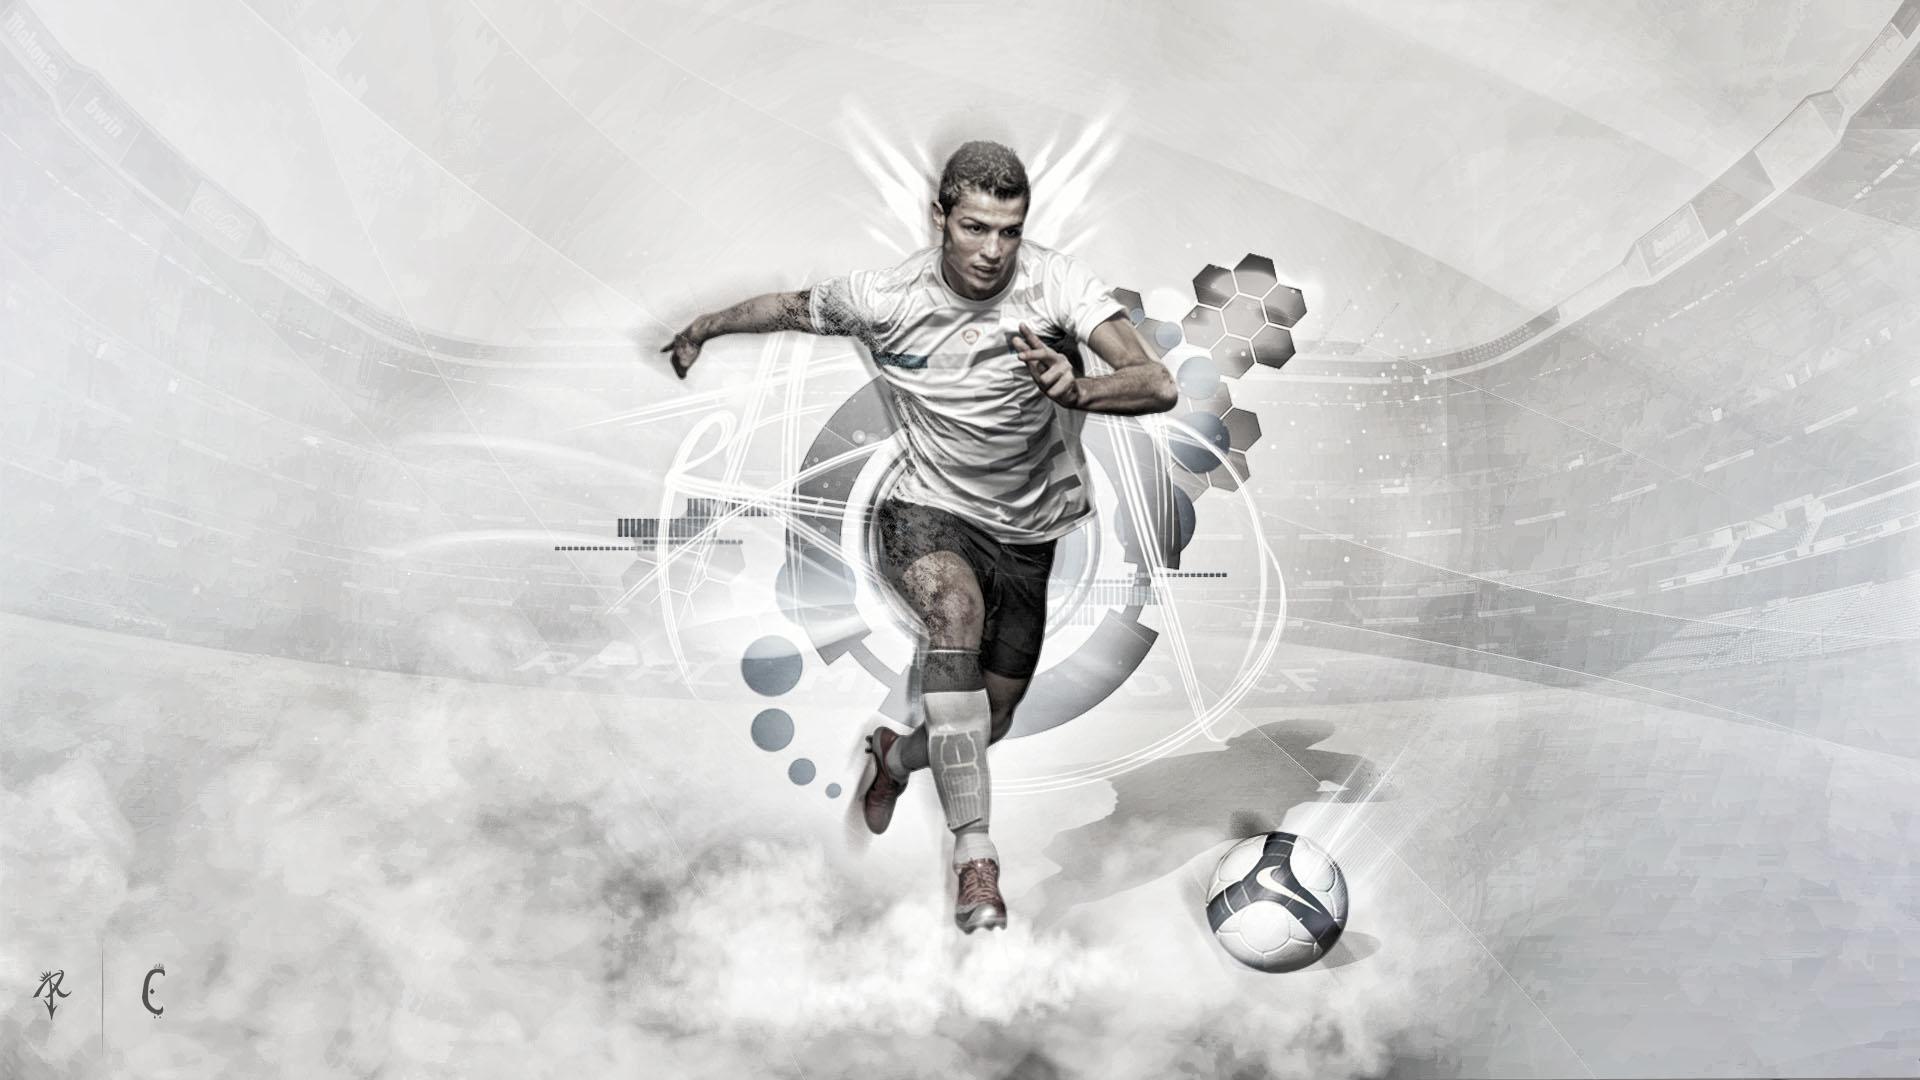 Cristiano Ronaldo Wallpaper Ft Rhyme By Cumamert